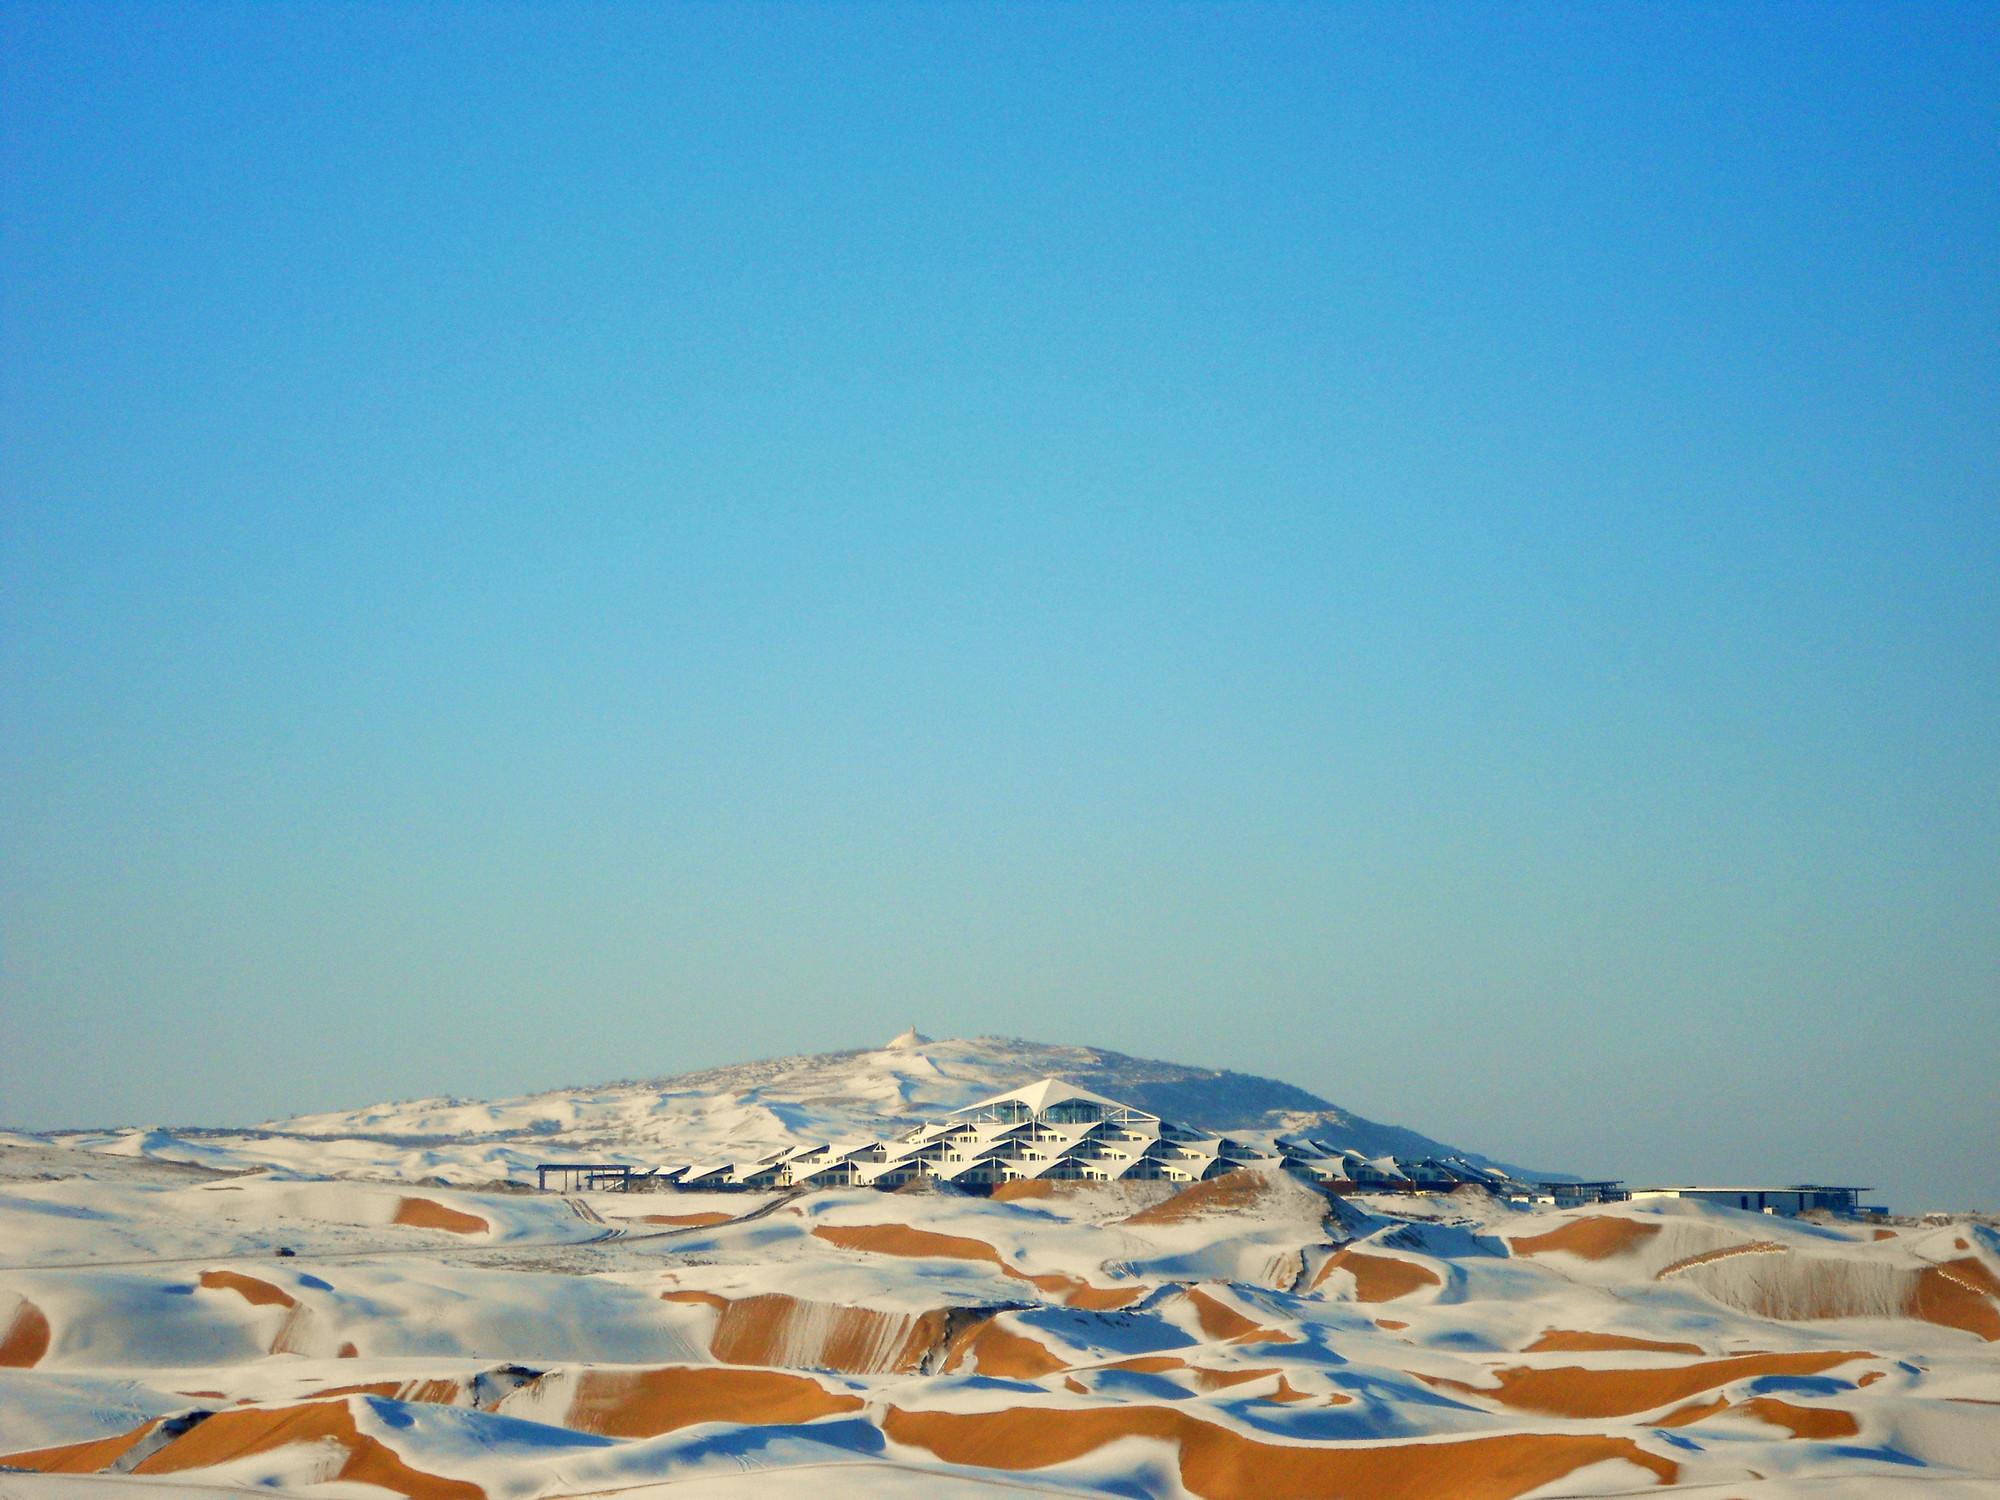 Gallery Of Xiangshawan Desert Lotus Hotel Plat